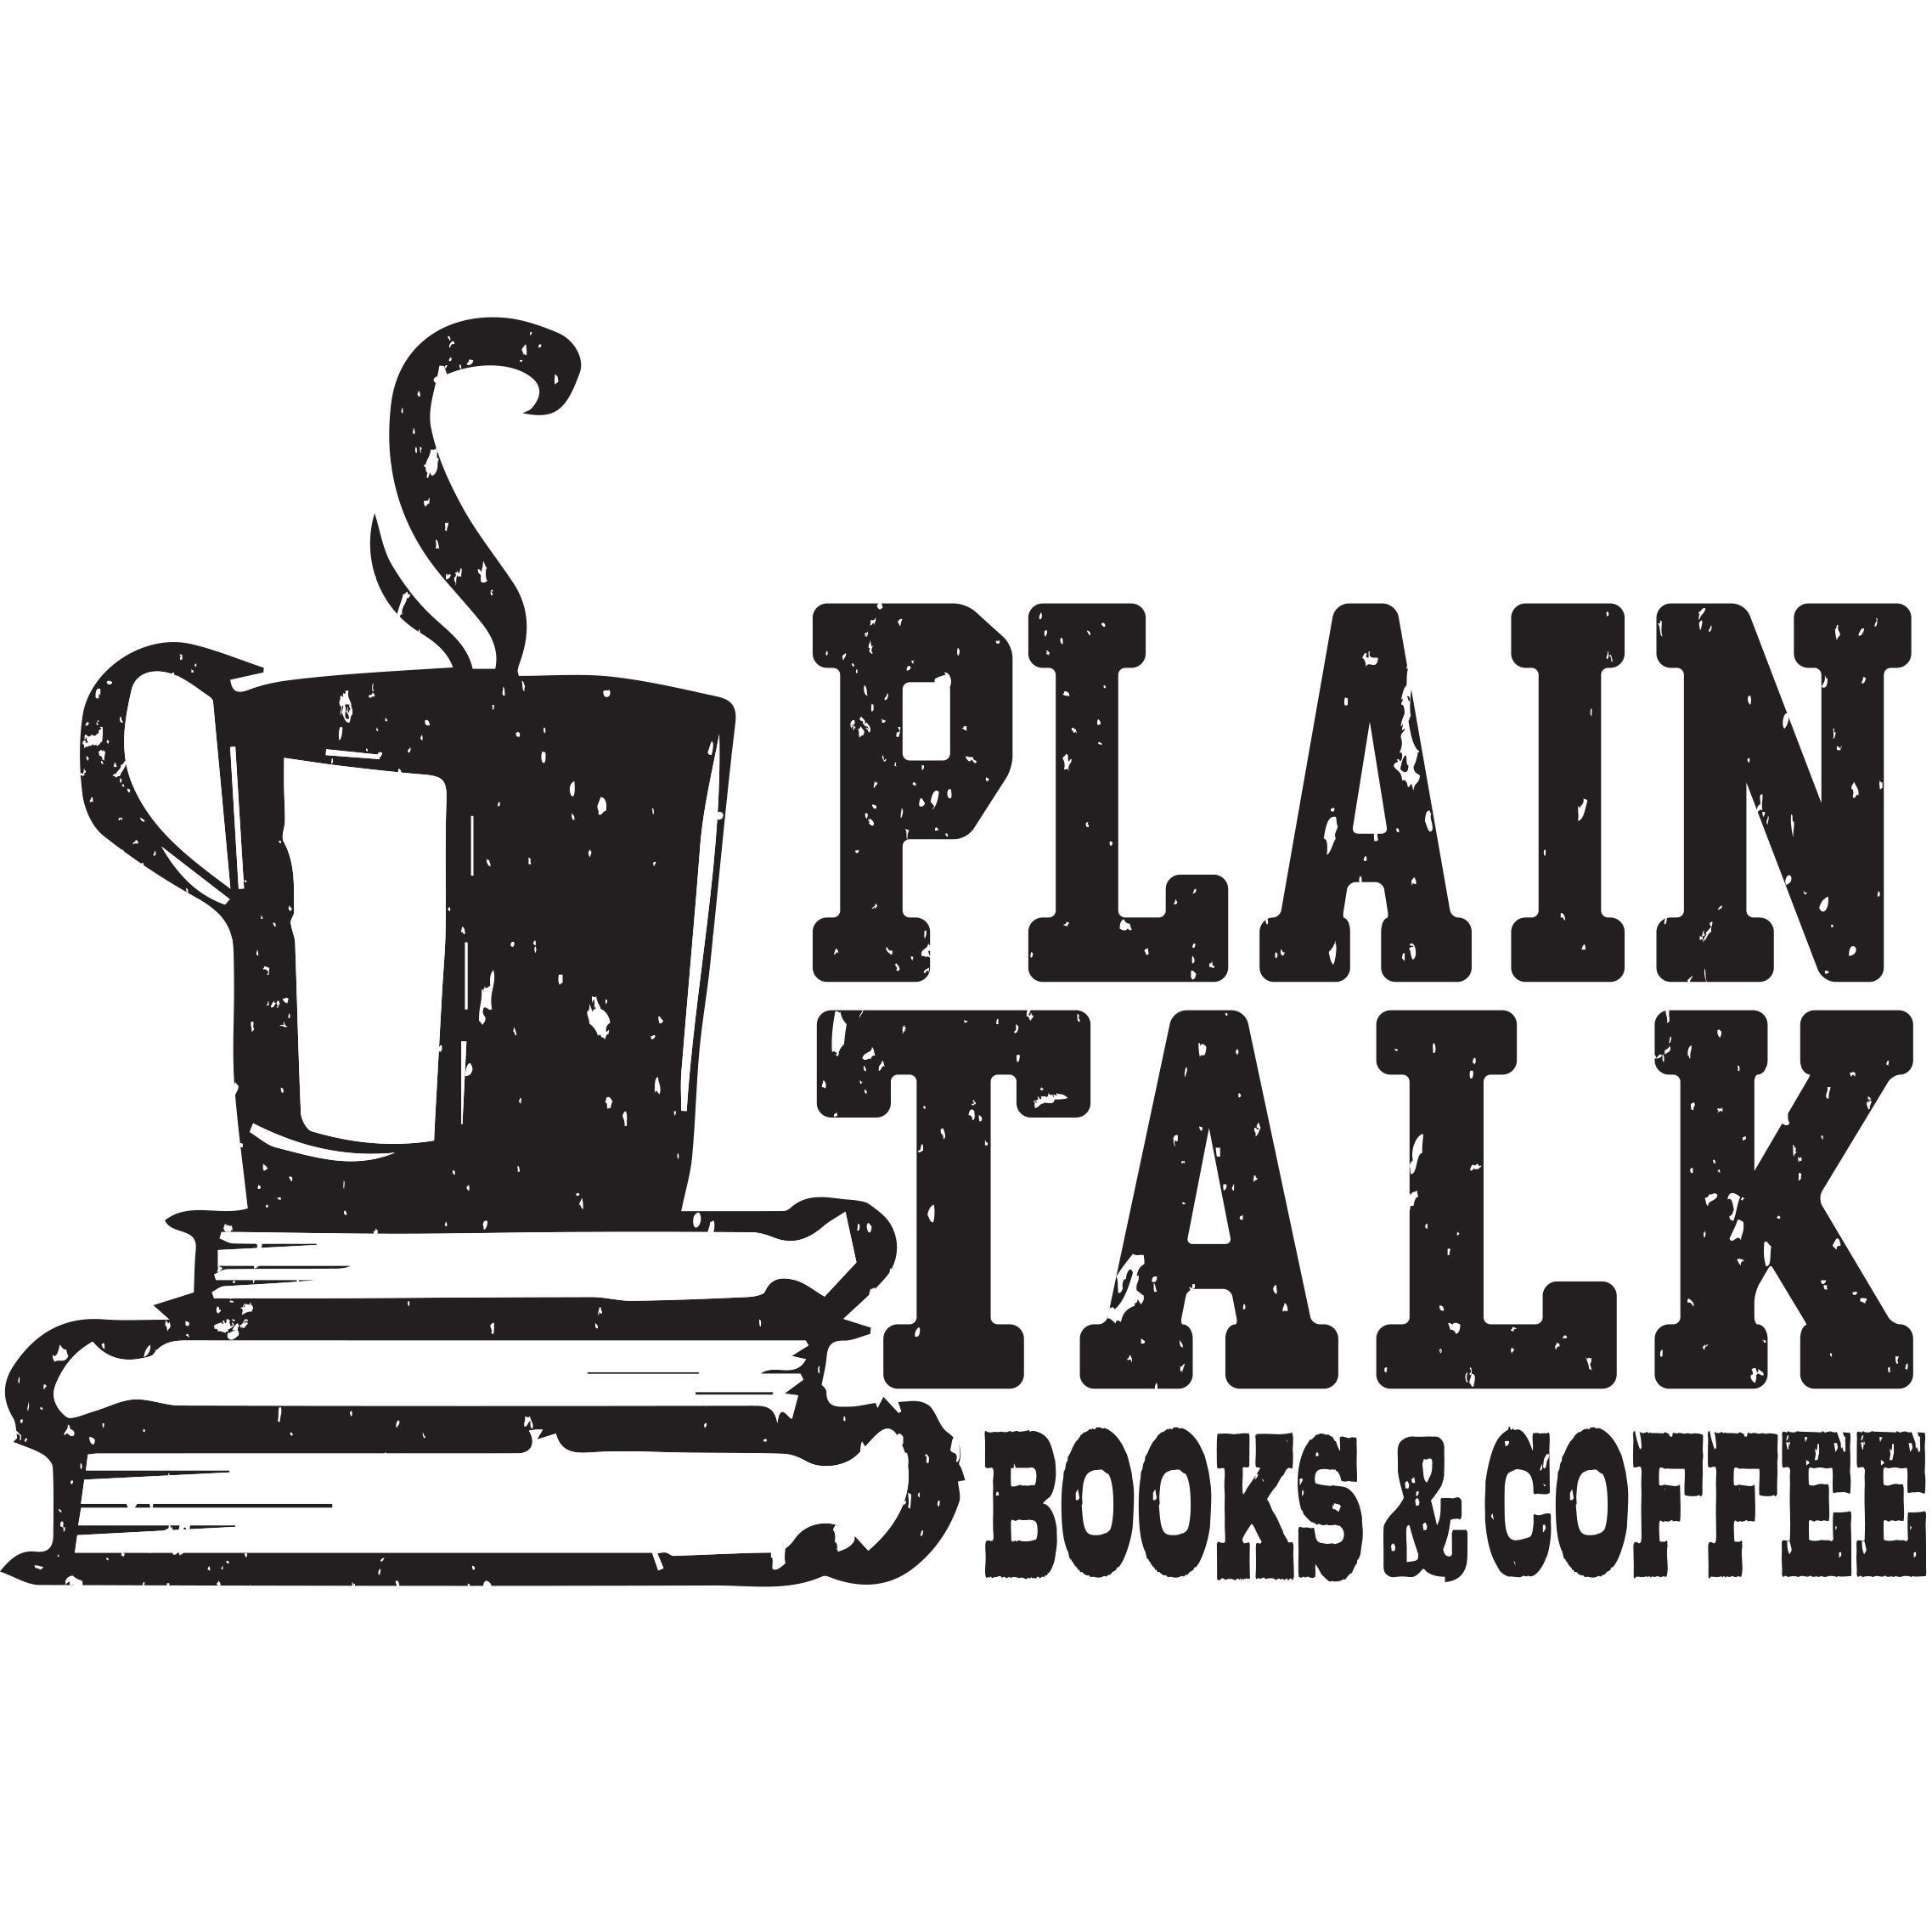 Plain Talk Books & Coffee - Des Moines, IA - Restaurants